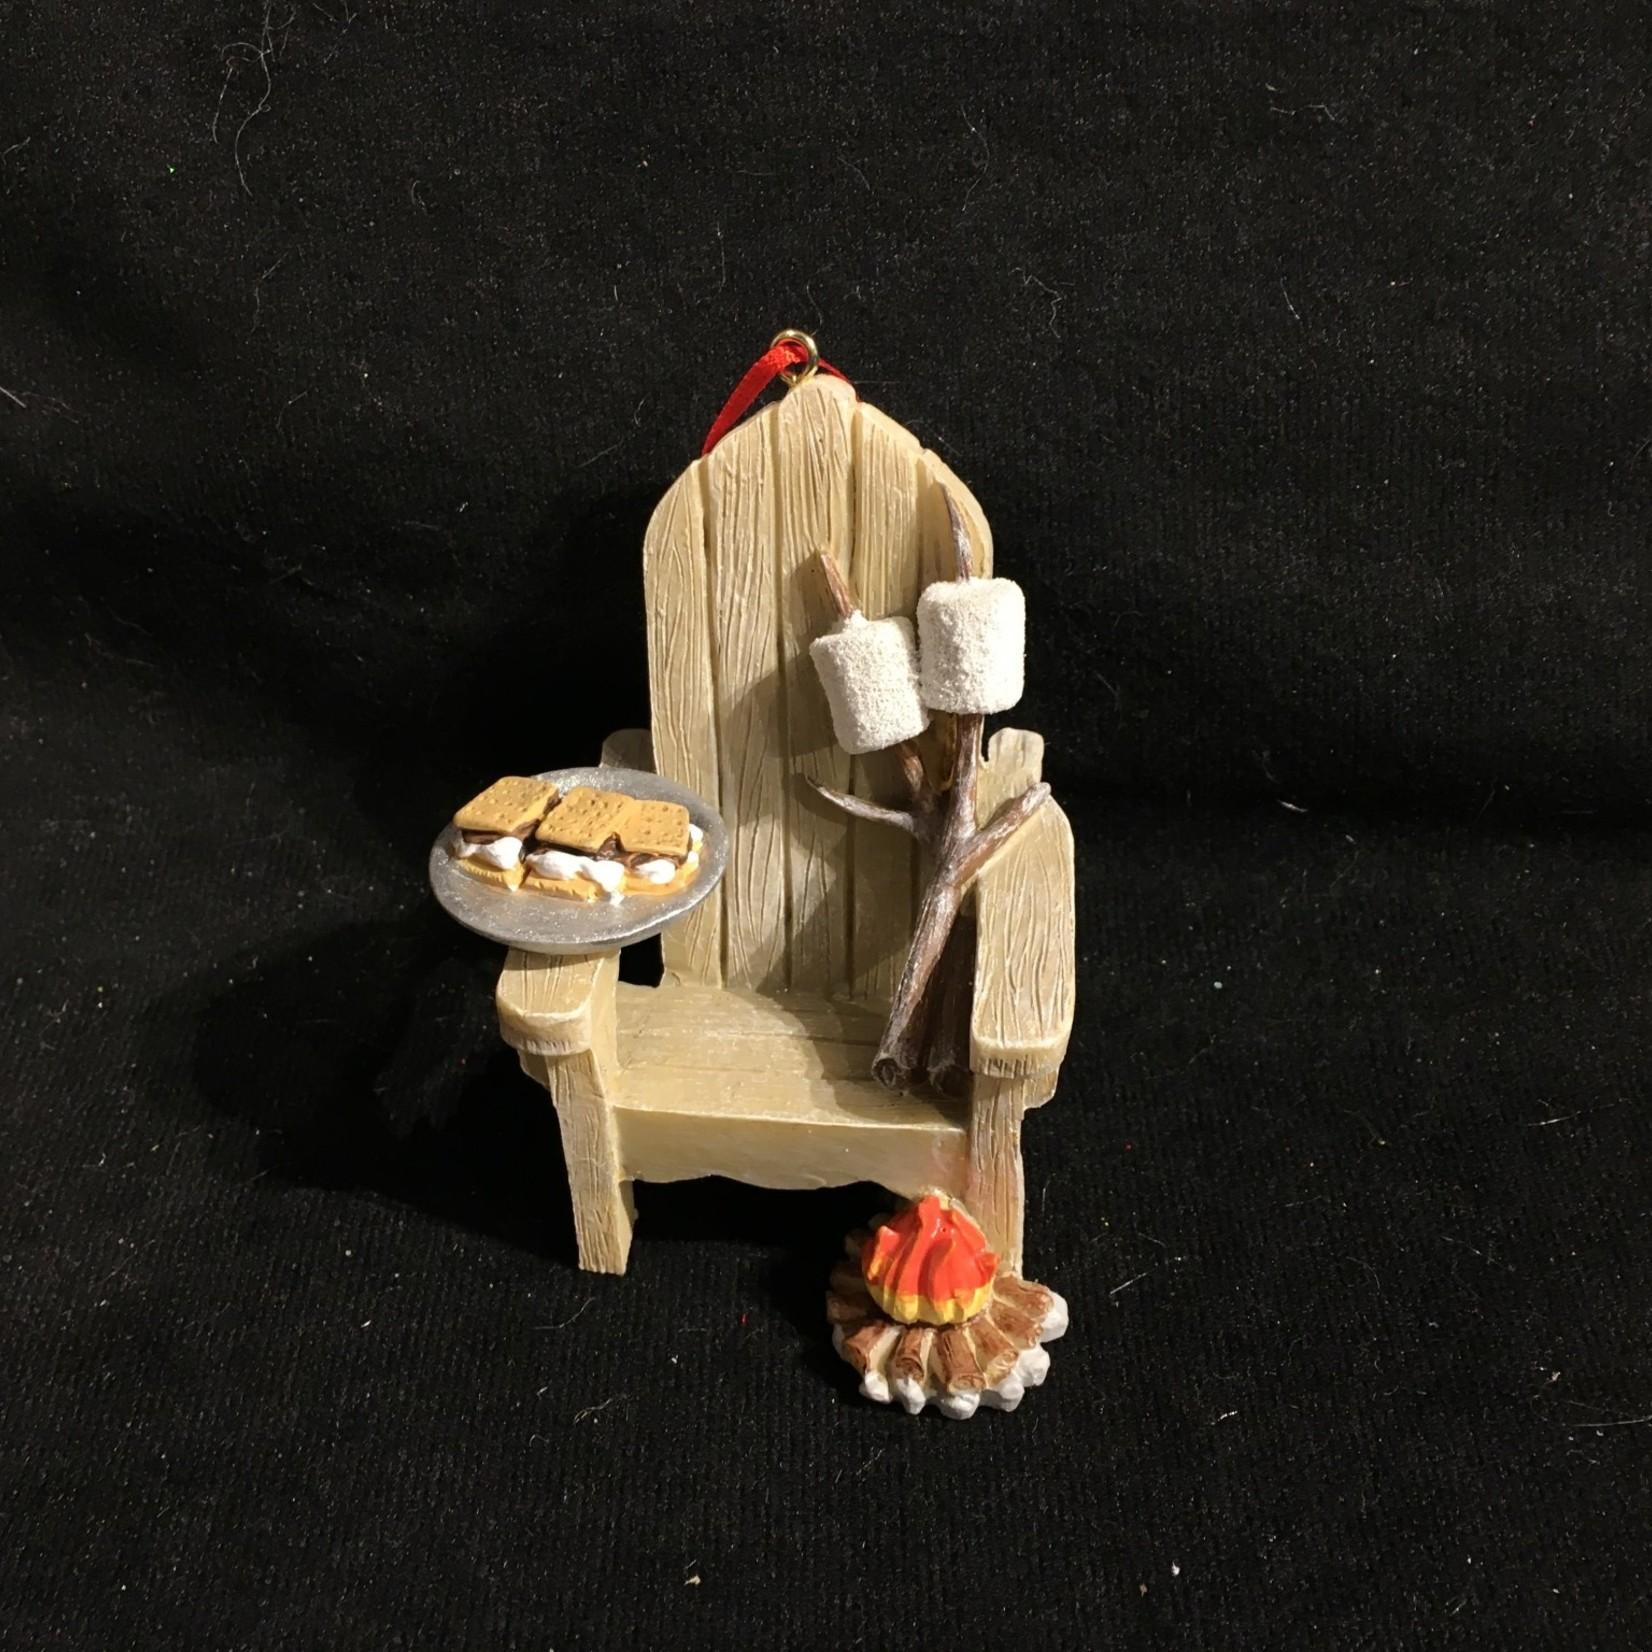 **Muskoka Chair w/S'More & Campfire Orn